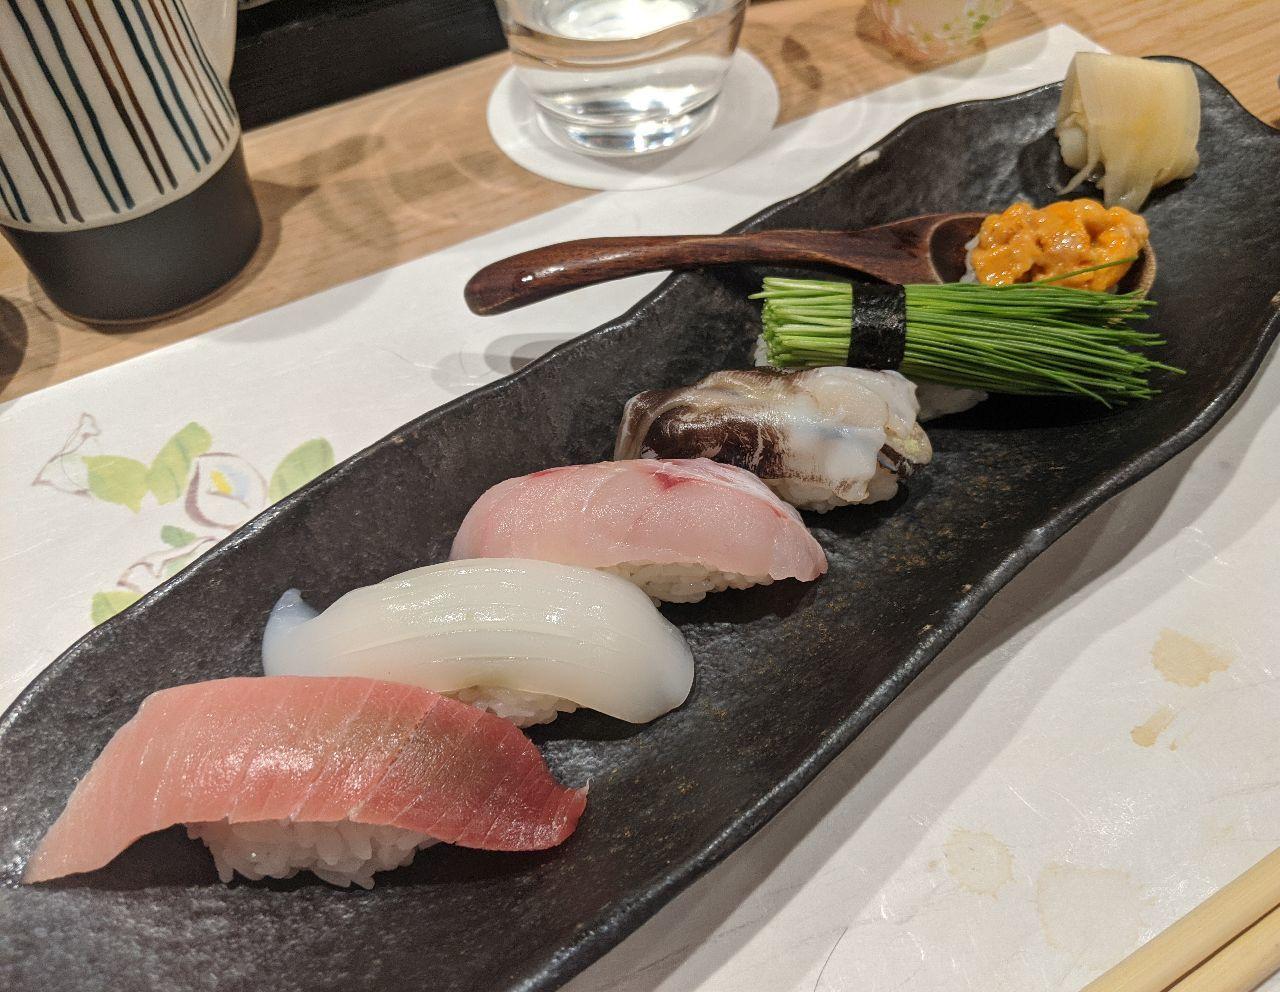 MVIMG_20200605_193152寿司(中トロ、アカイカ、アカムツ、生トリ貝、芽ネギ、バフンウニ)